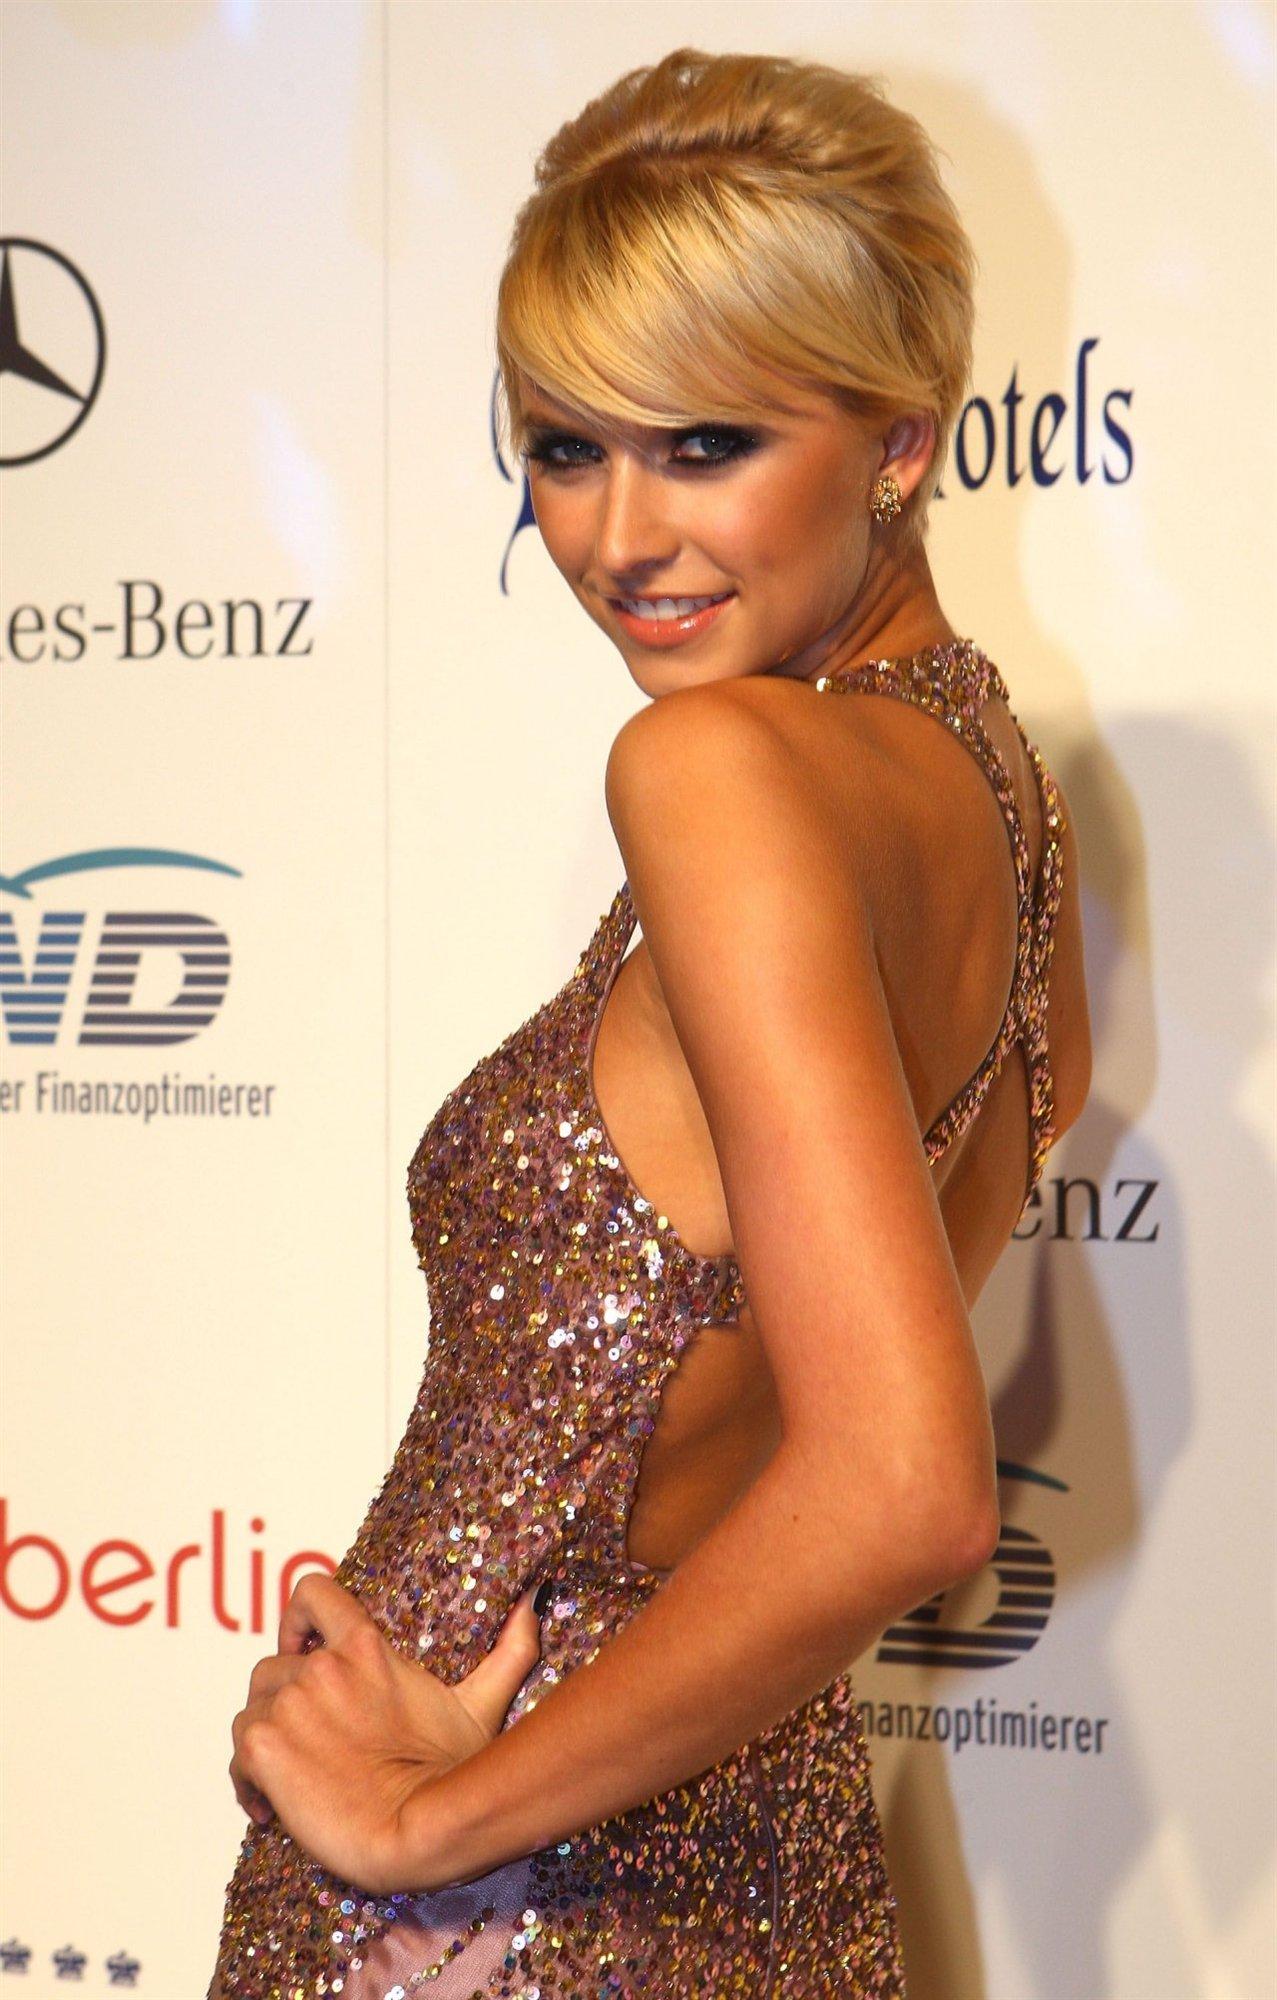 Лена Герке (Лена Gercke)